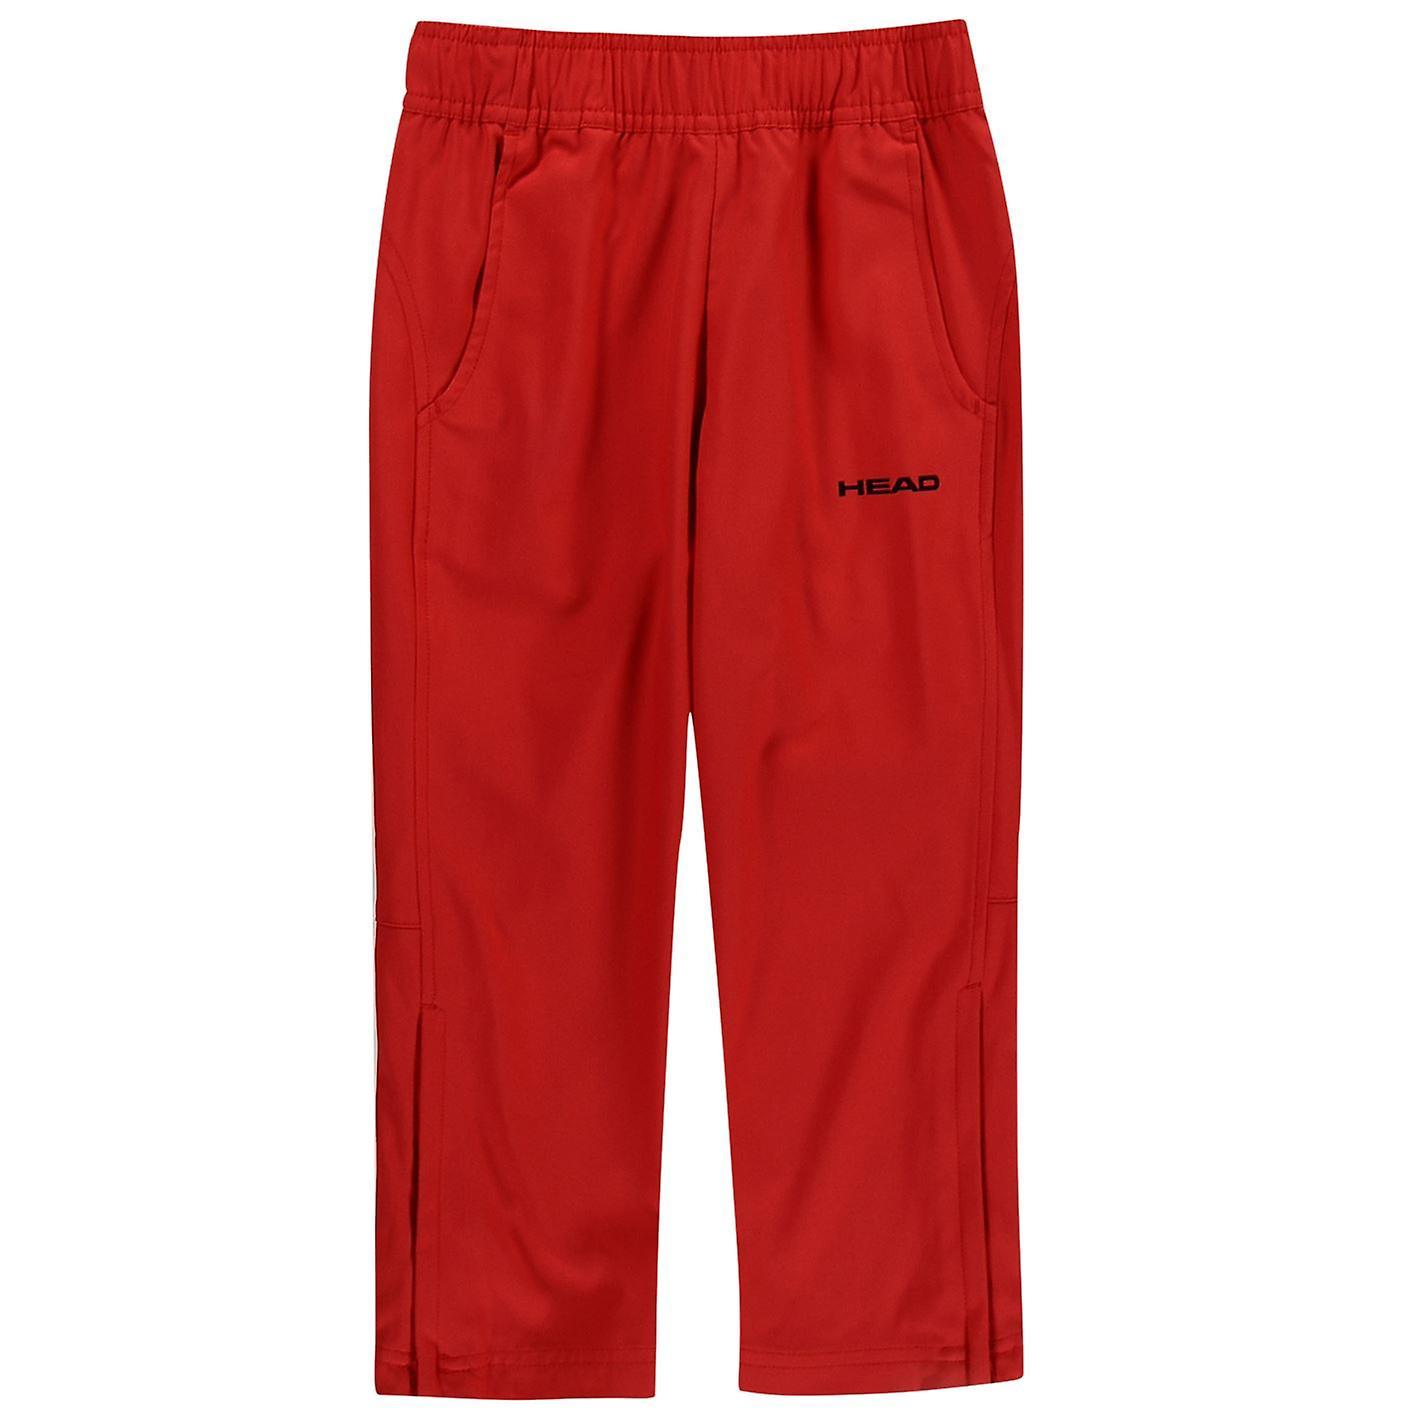 HEAD Kids Club Trousers Track Pants Bottoms Jogging Zip Warm Elasticated Waist